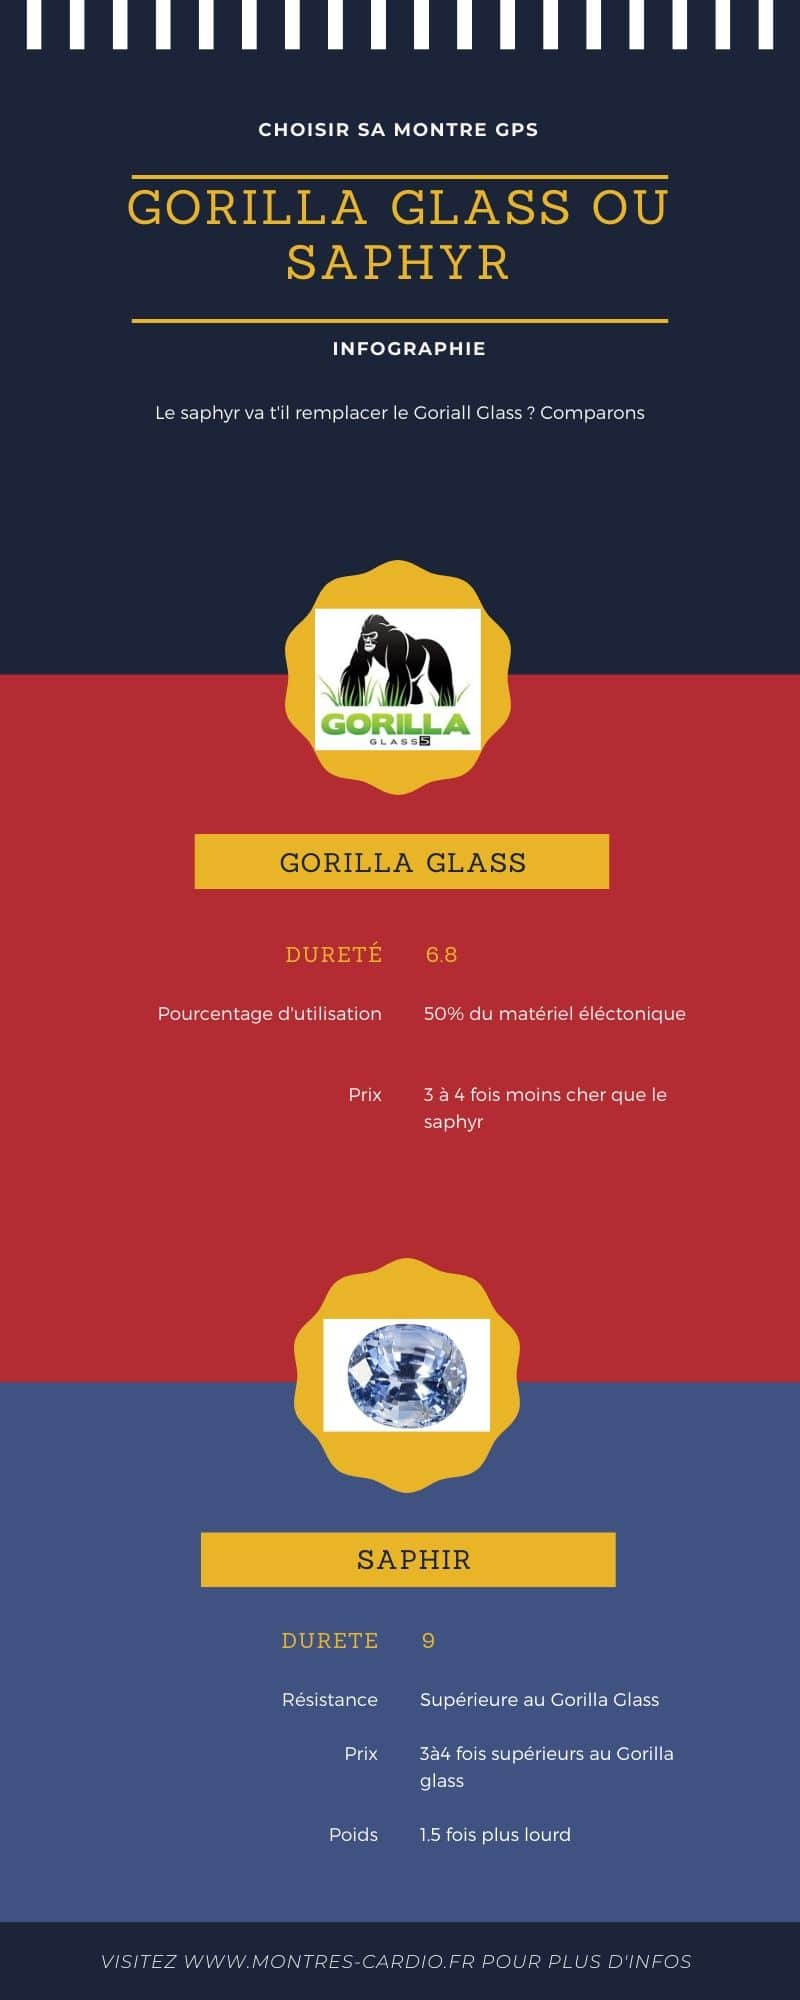 infographie montre gps gorilla glass saphyr